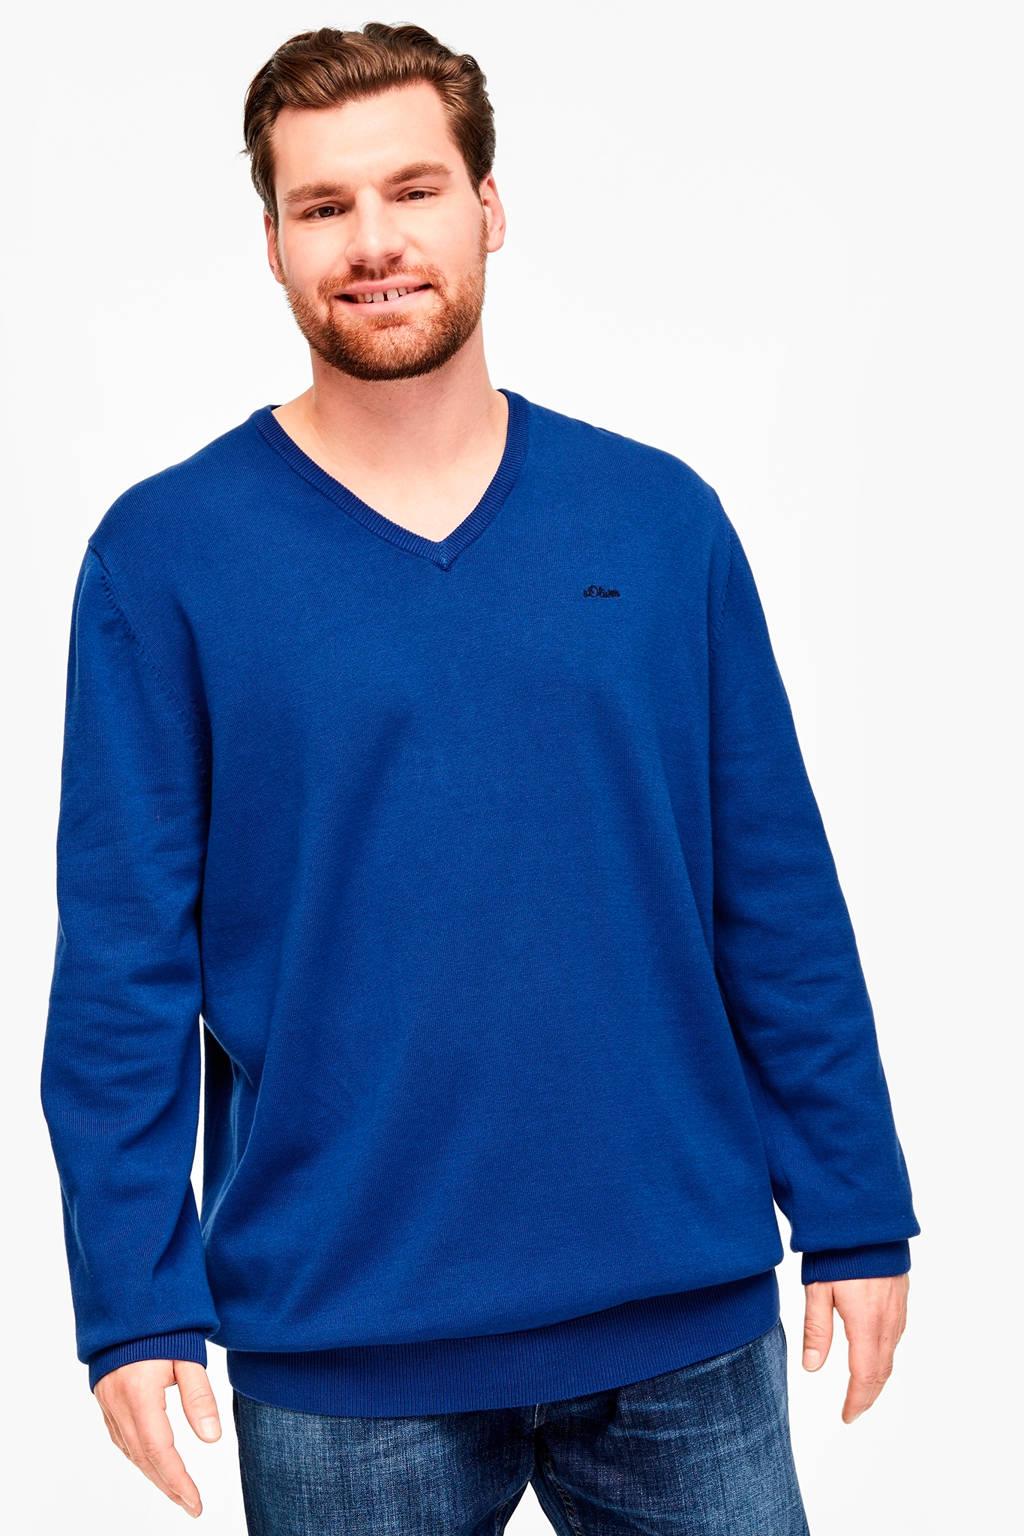 s.Oliver Big Size trui blauw Big size, Blauw